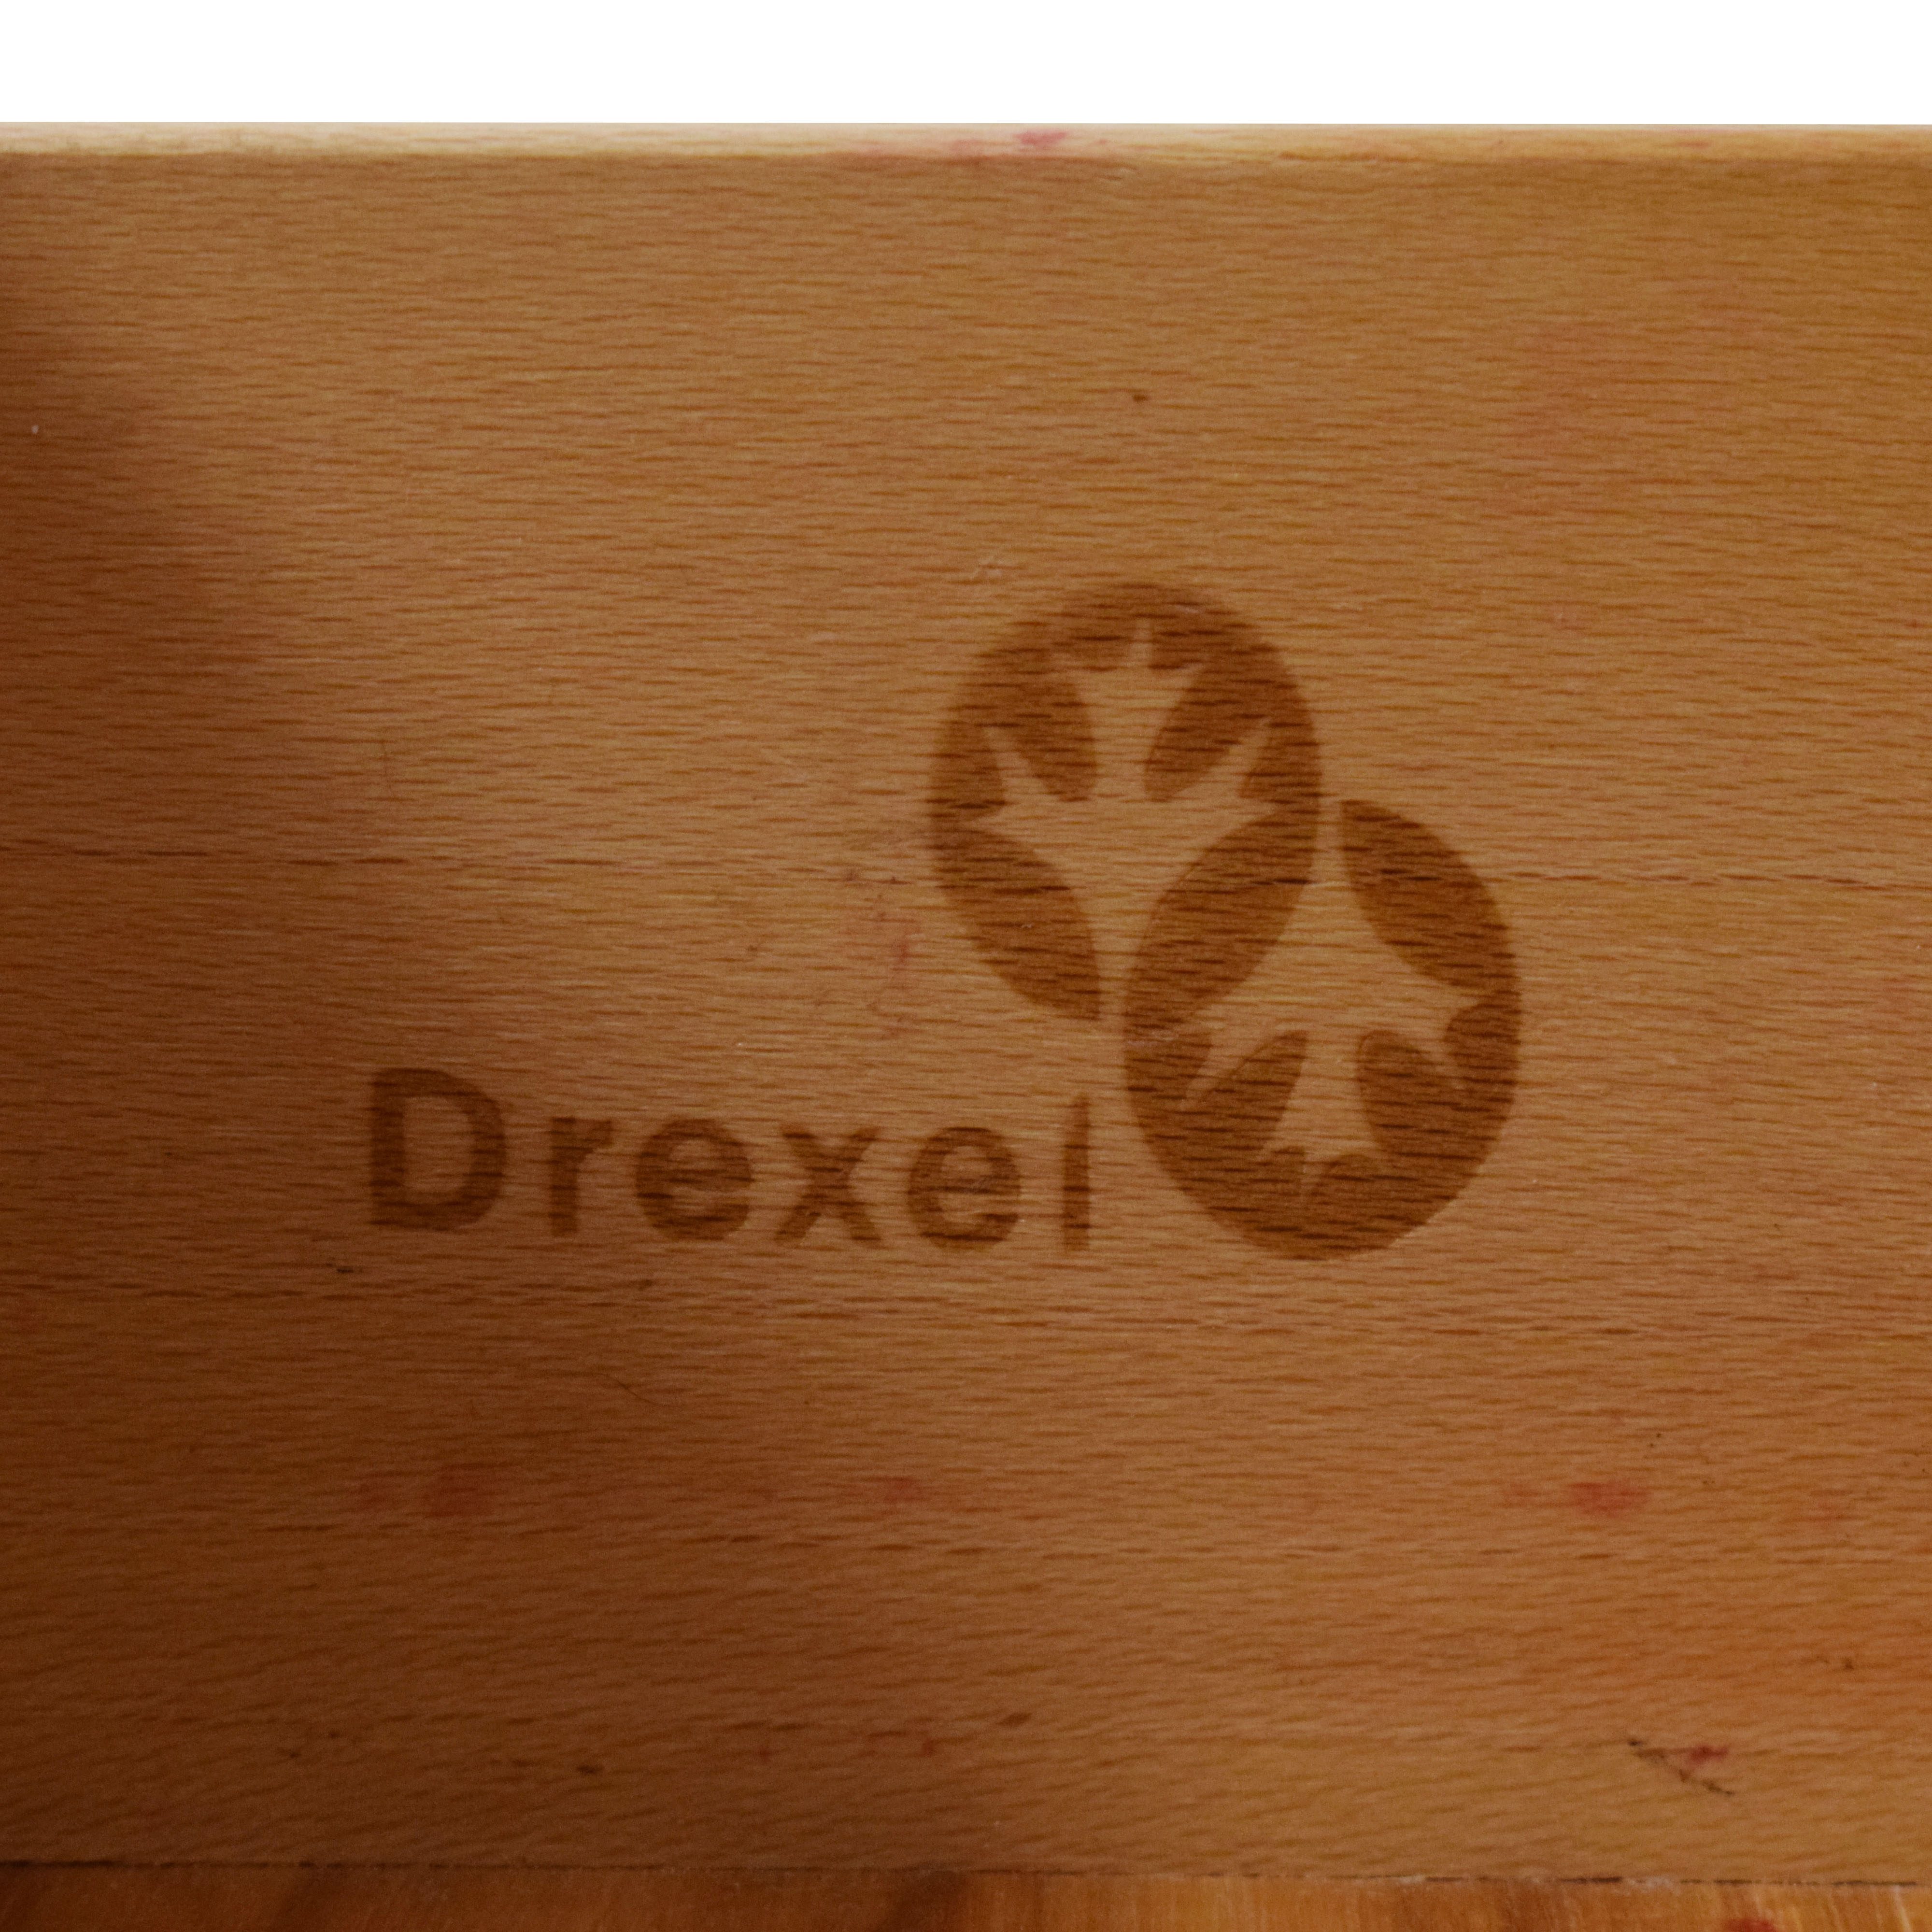 shop Drexel Heritage Glass Top Side Table Drexel Heritage Tables